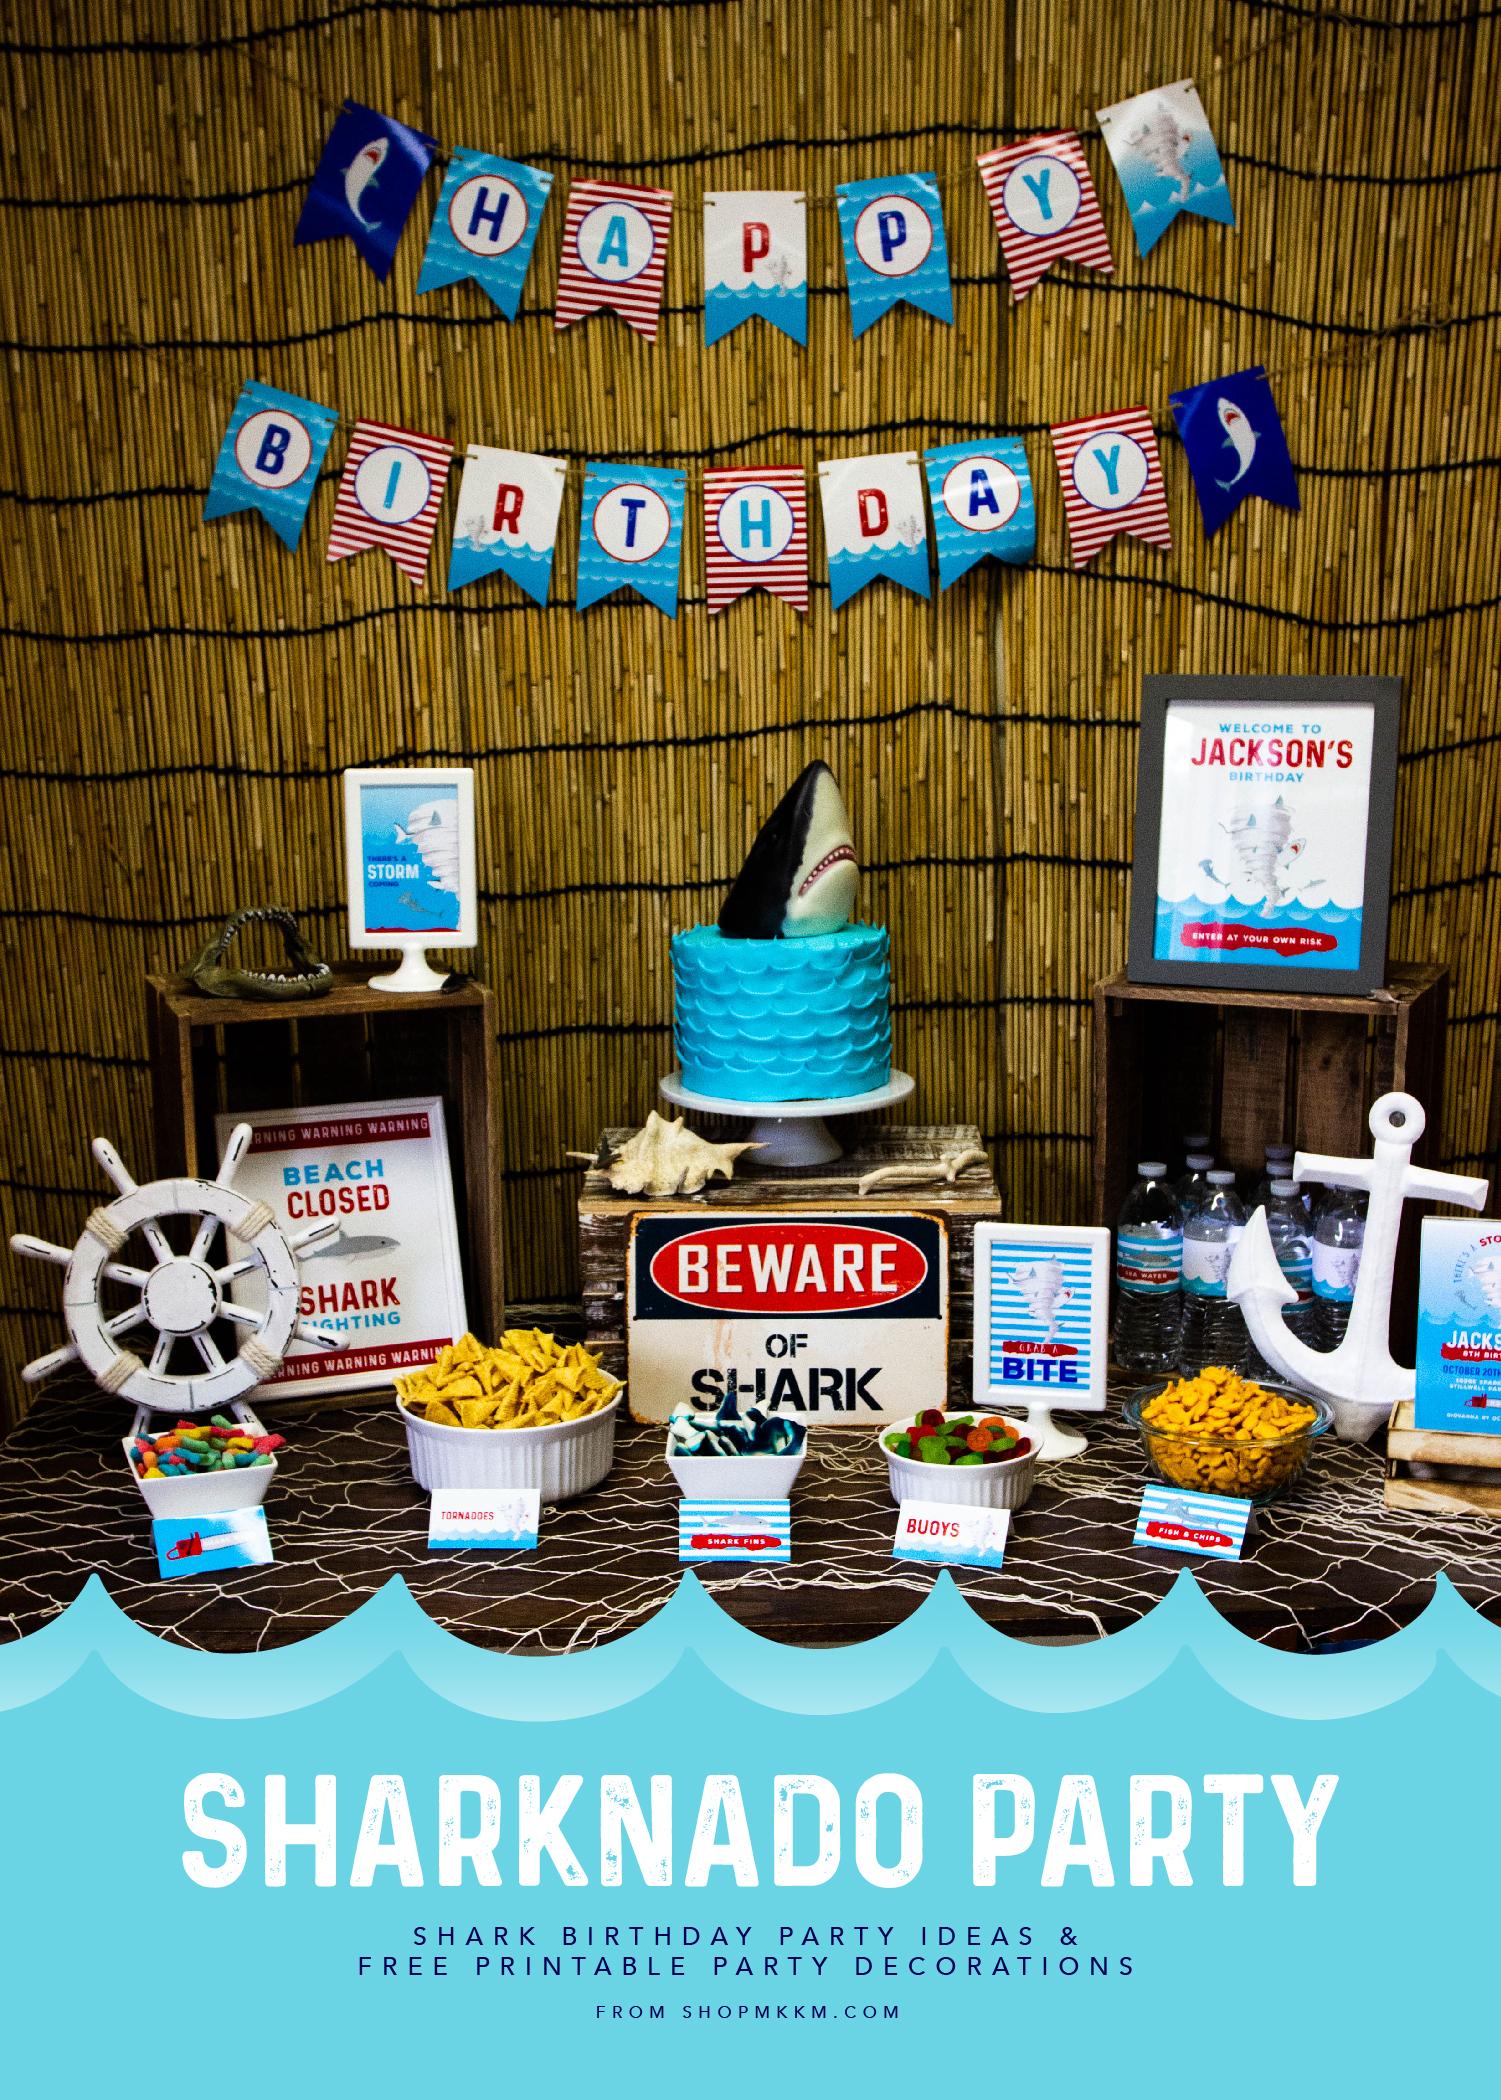 Sharknado Party Ideas & Free Printables ✦ Boy Birthday Ideas ✦ #freebiefridays // ✦ mkkmdesigns